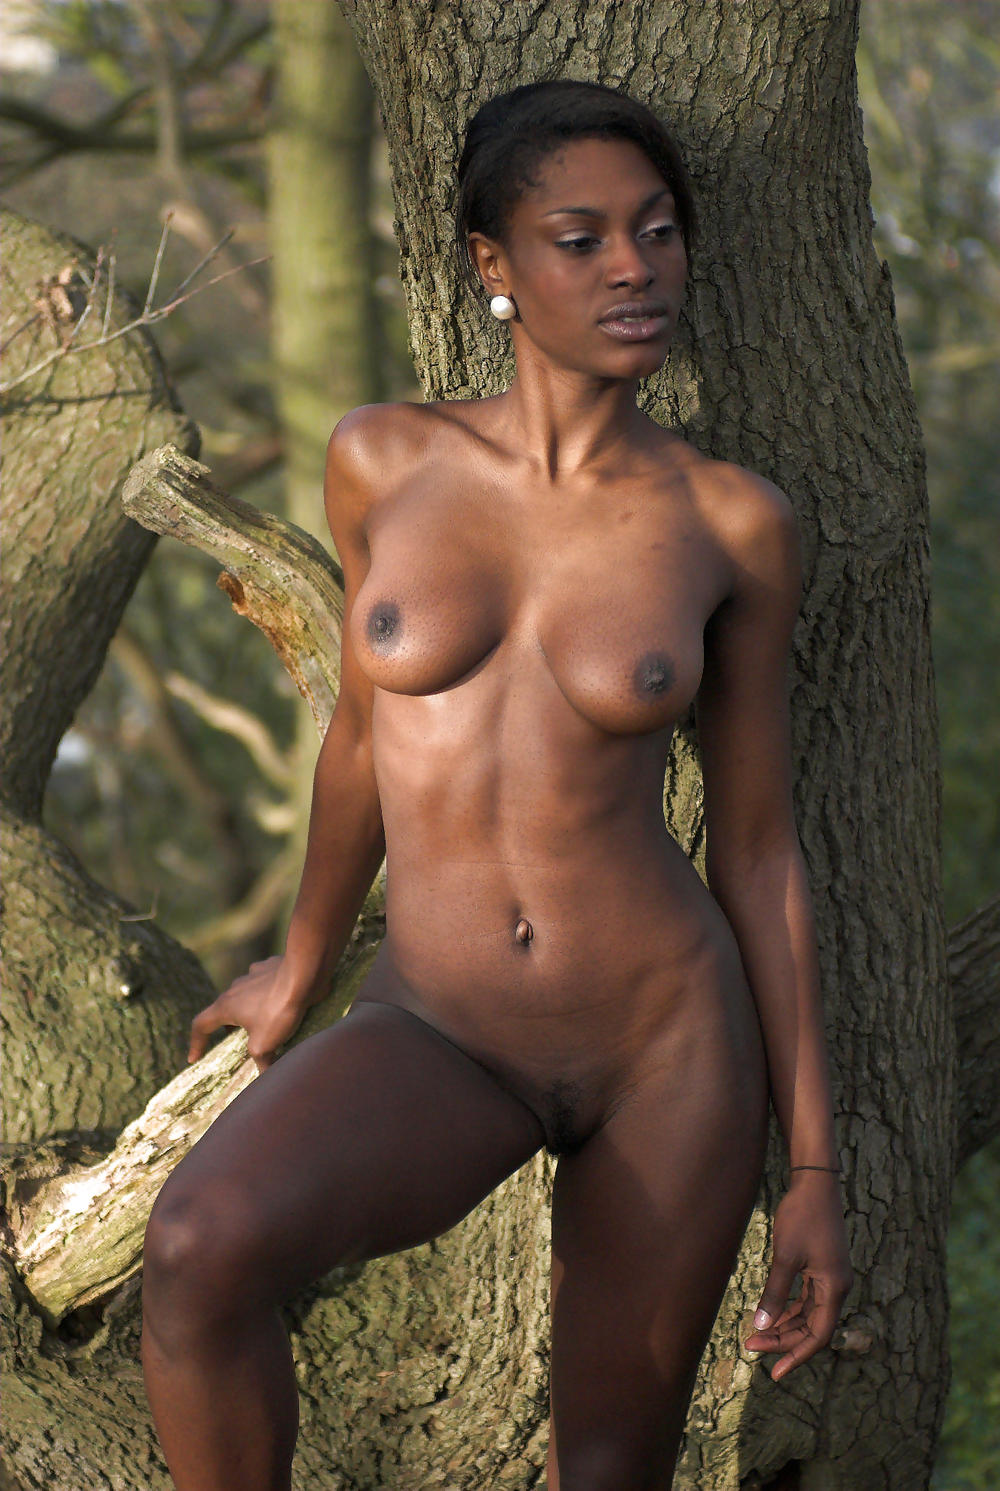 naked-black-women-photo-gallery-real-slut-homemade-porn